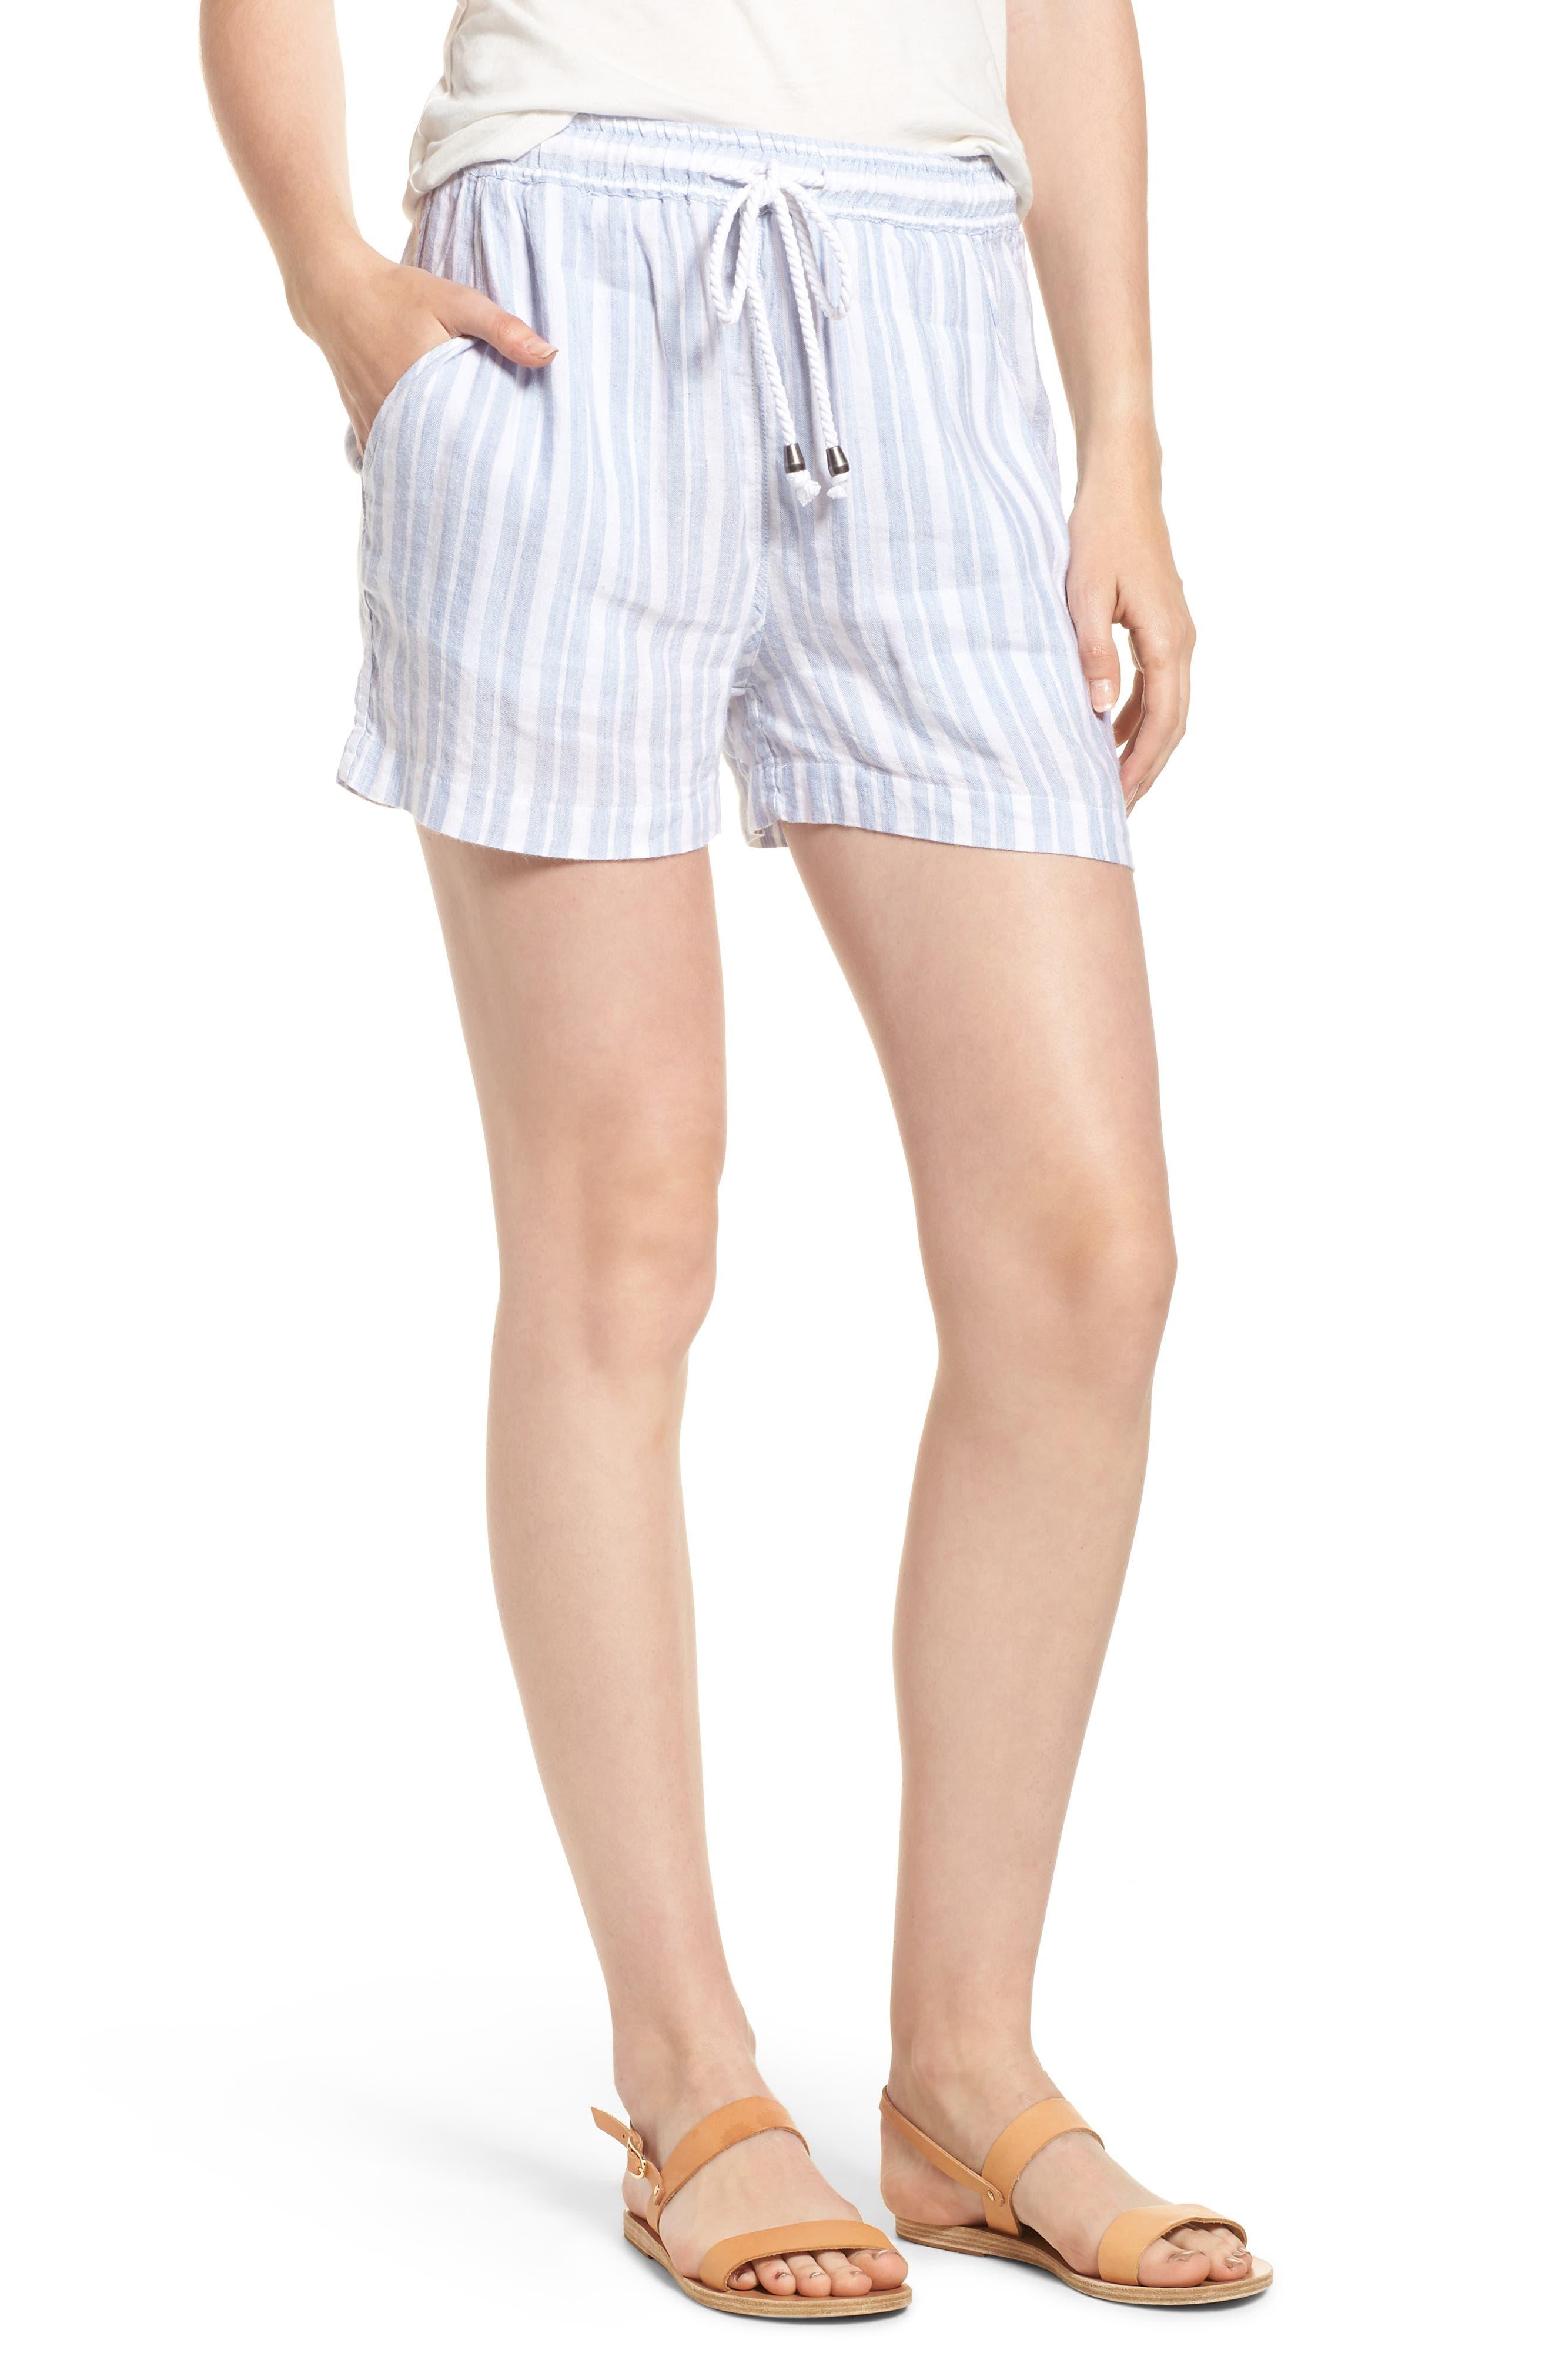 Brea Shorts,                             Main thumbnail 1, color,                             HOLLAND STRIPE